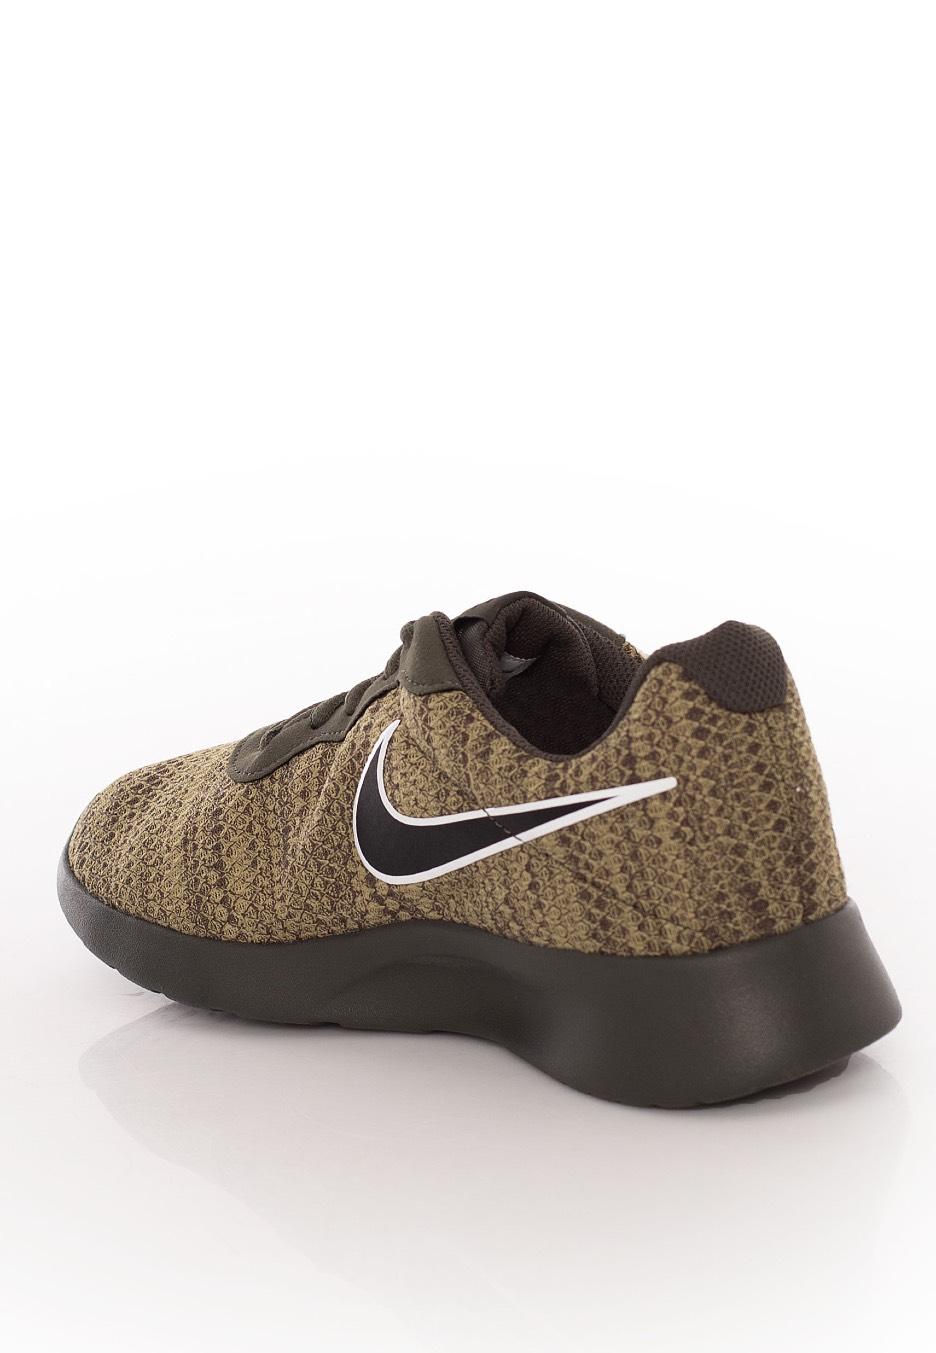 f68247210516 ... release date nike tanjun premium cargo khaki black neutral olive shoes  30e78 5de4d